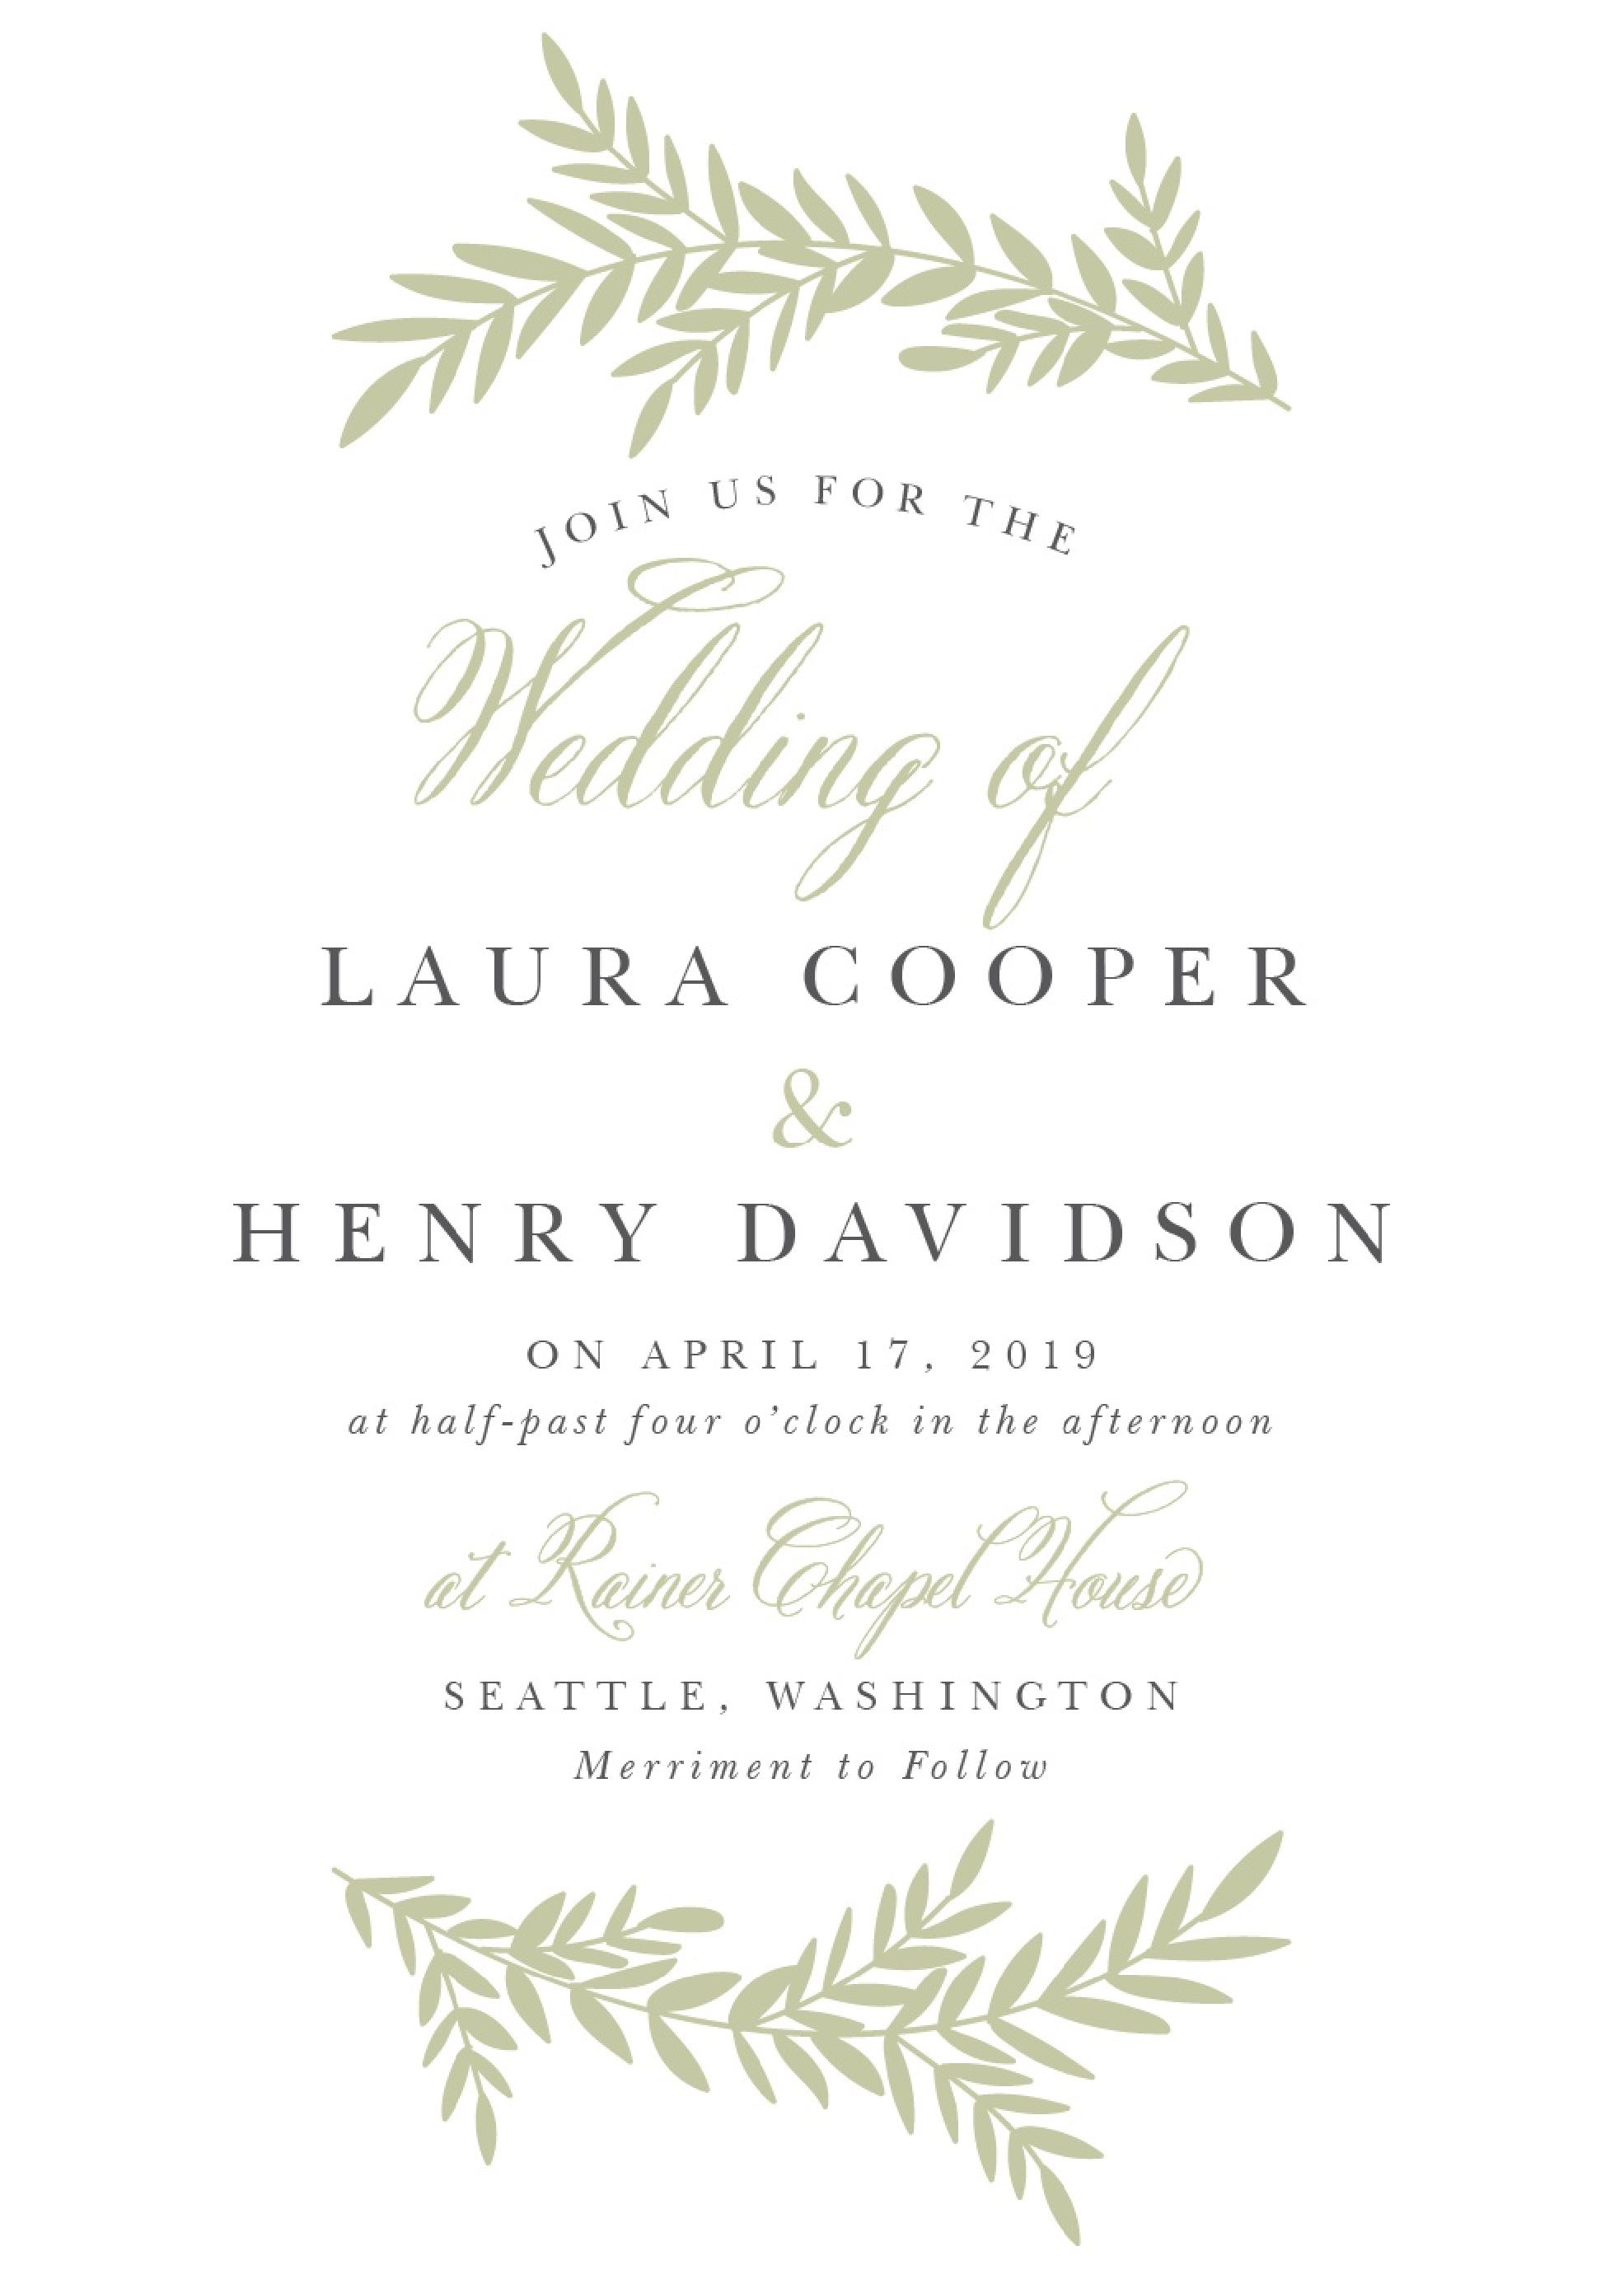 Wedding Invitation Template Card Wedding Invitation Wording Templates Wedding Invitation Etiquette Wedding Invitations Examples